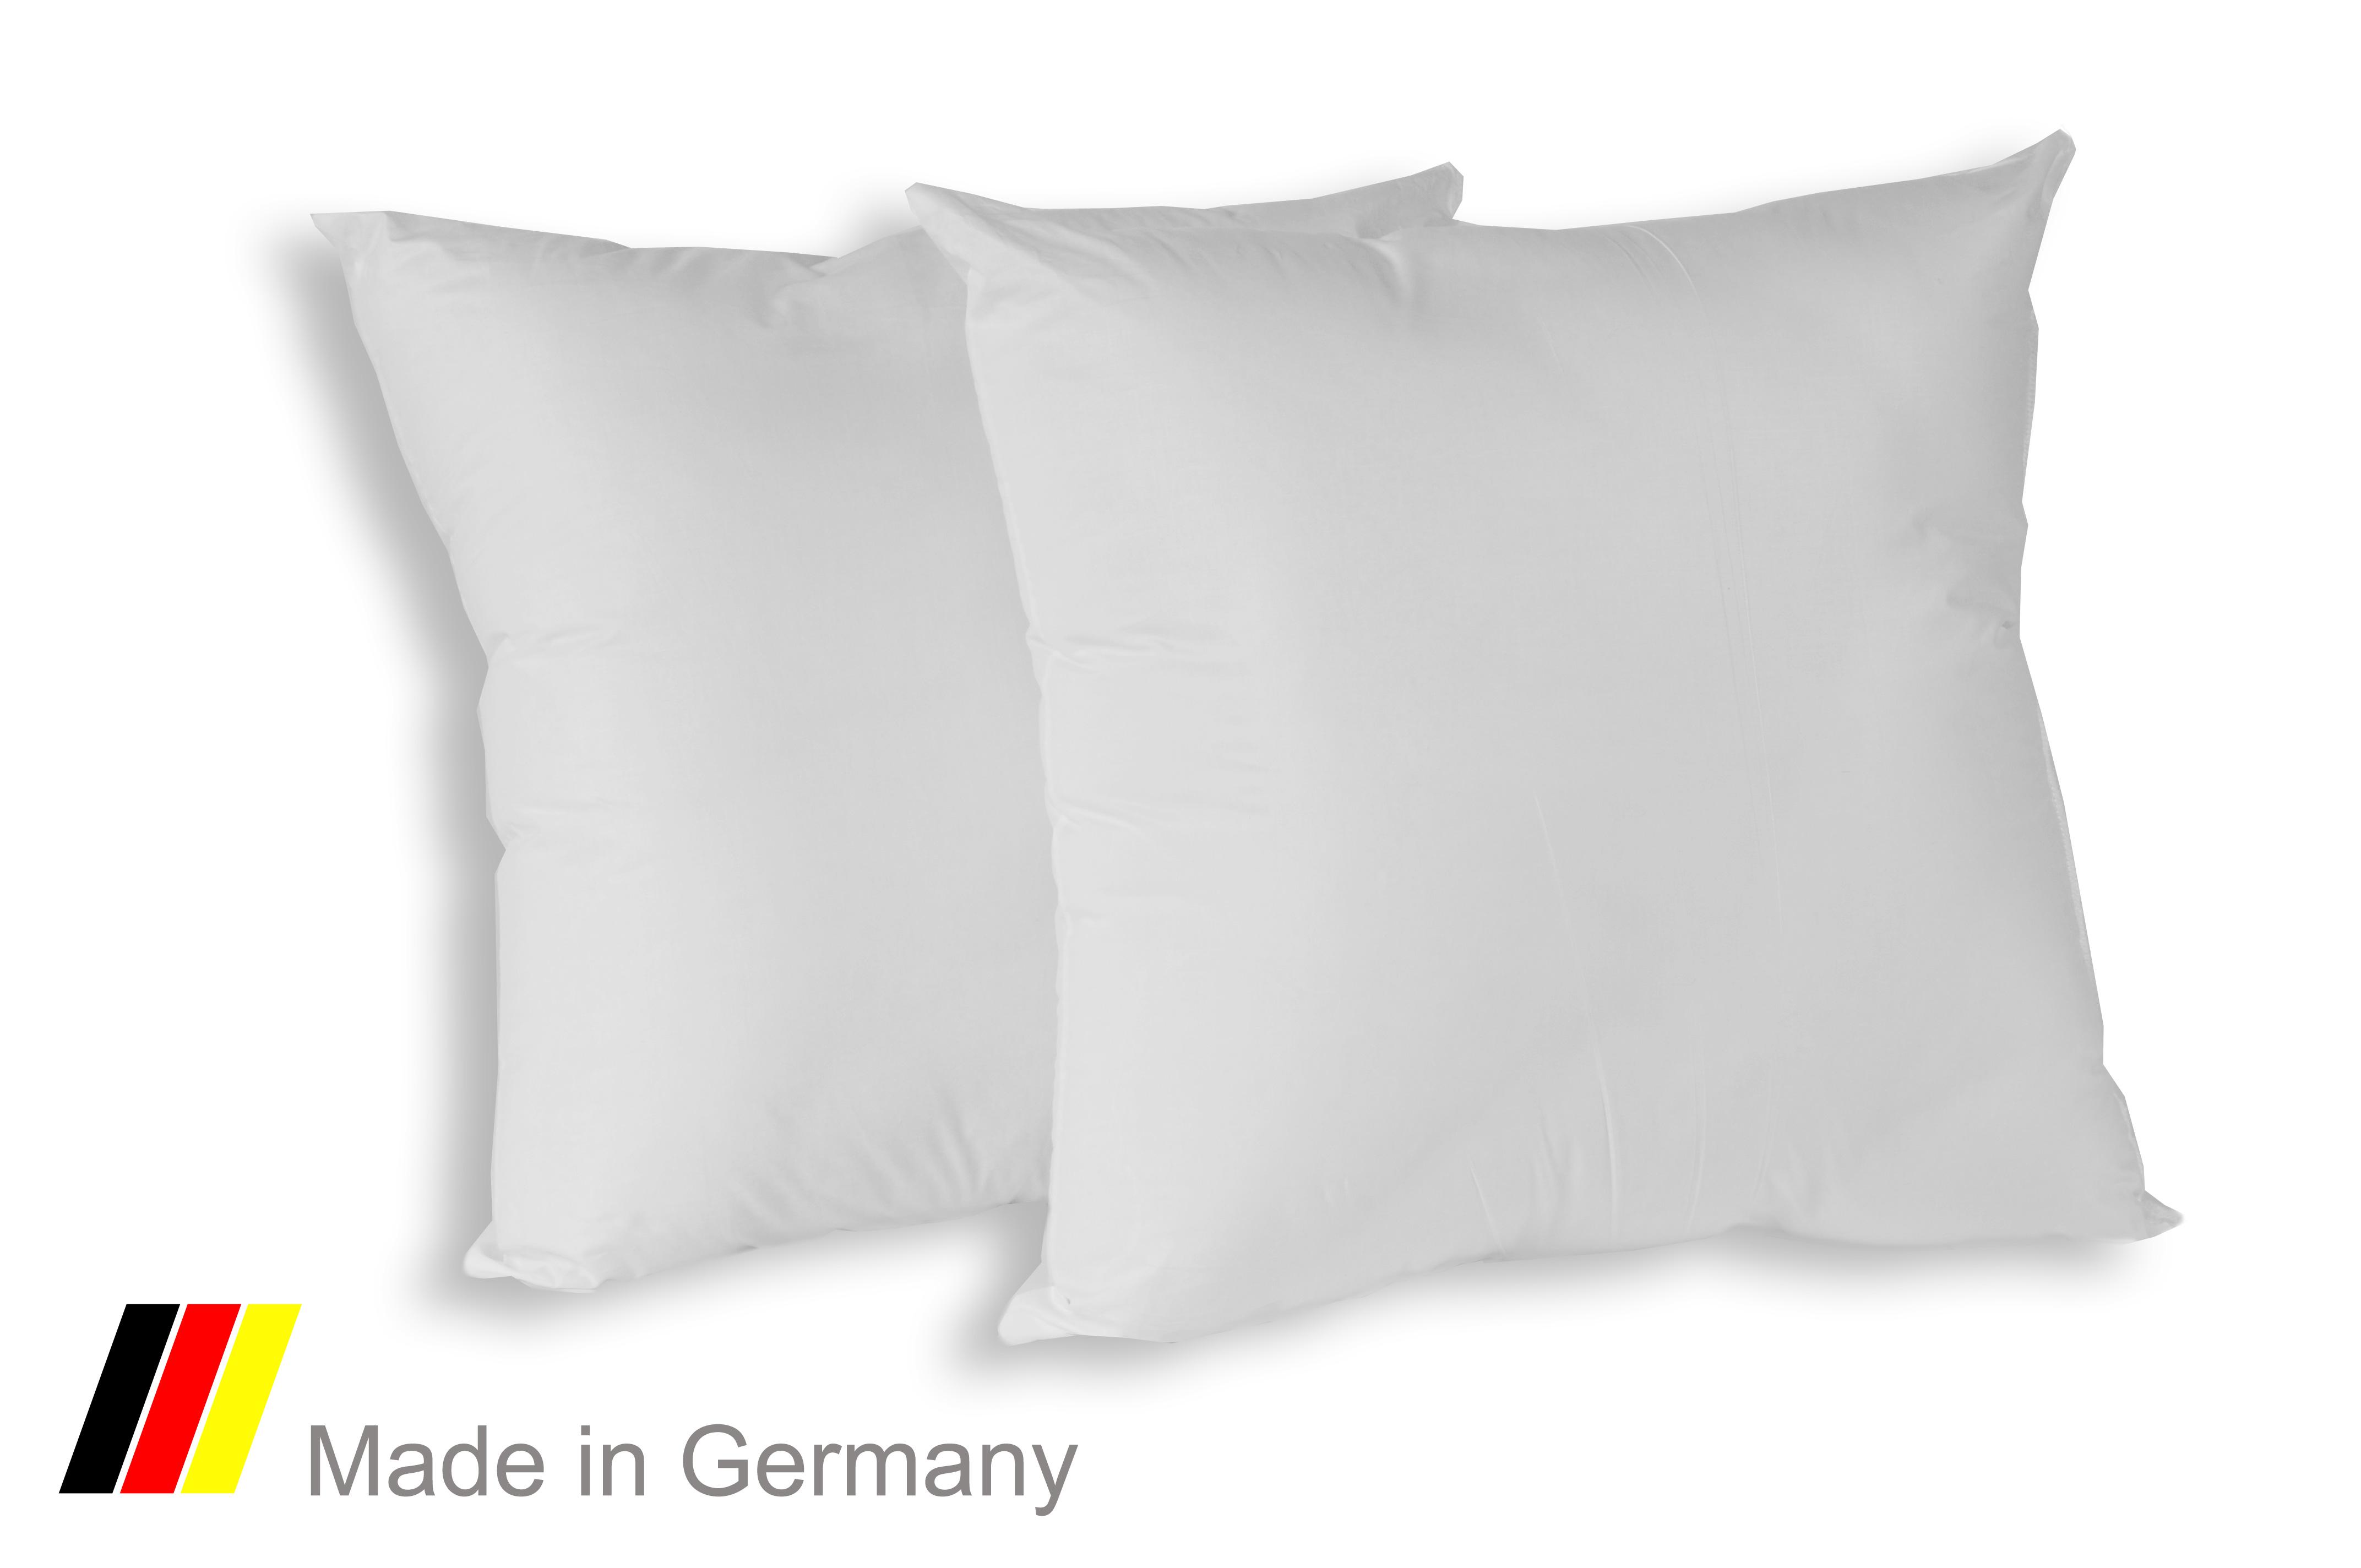 merino betten f llkissen dekokissen inlett kissen 80x80 cm standard doppelpack. Black Bedroom Furniture Sets. Home Design Ideas